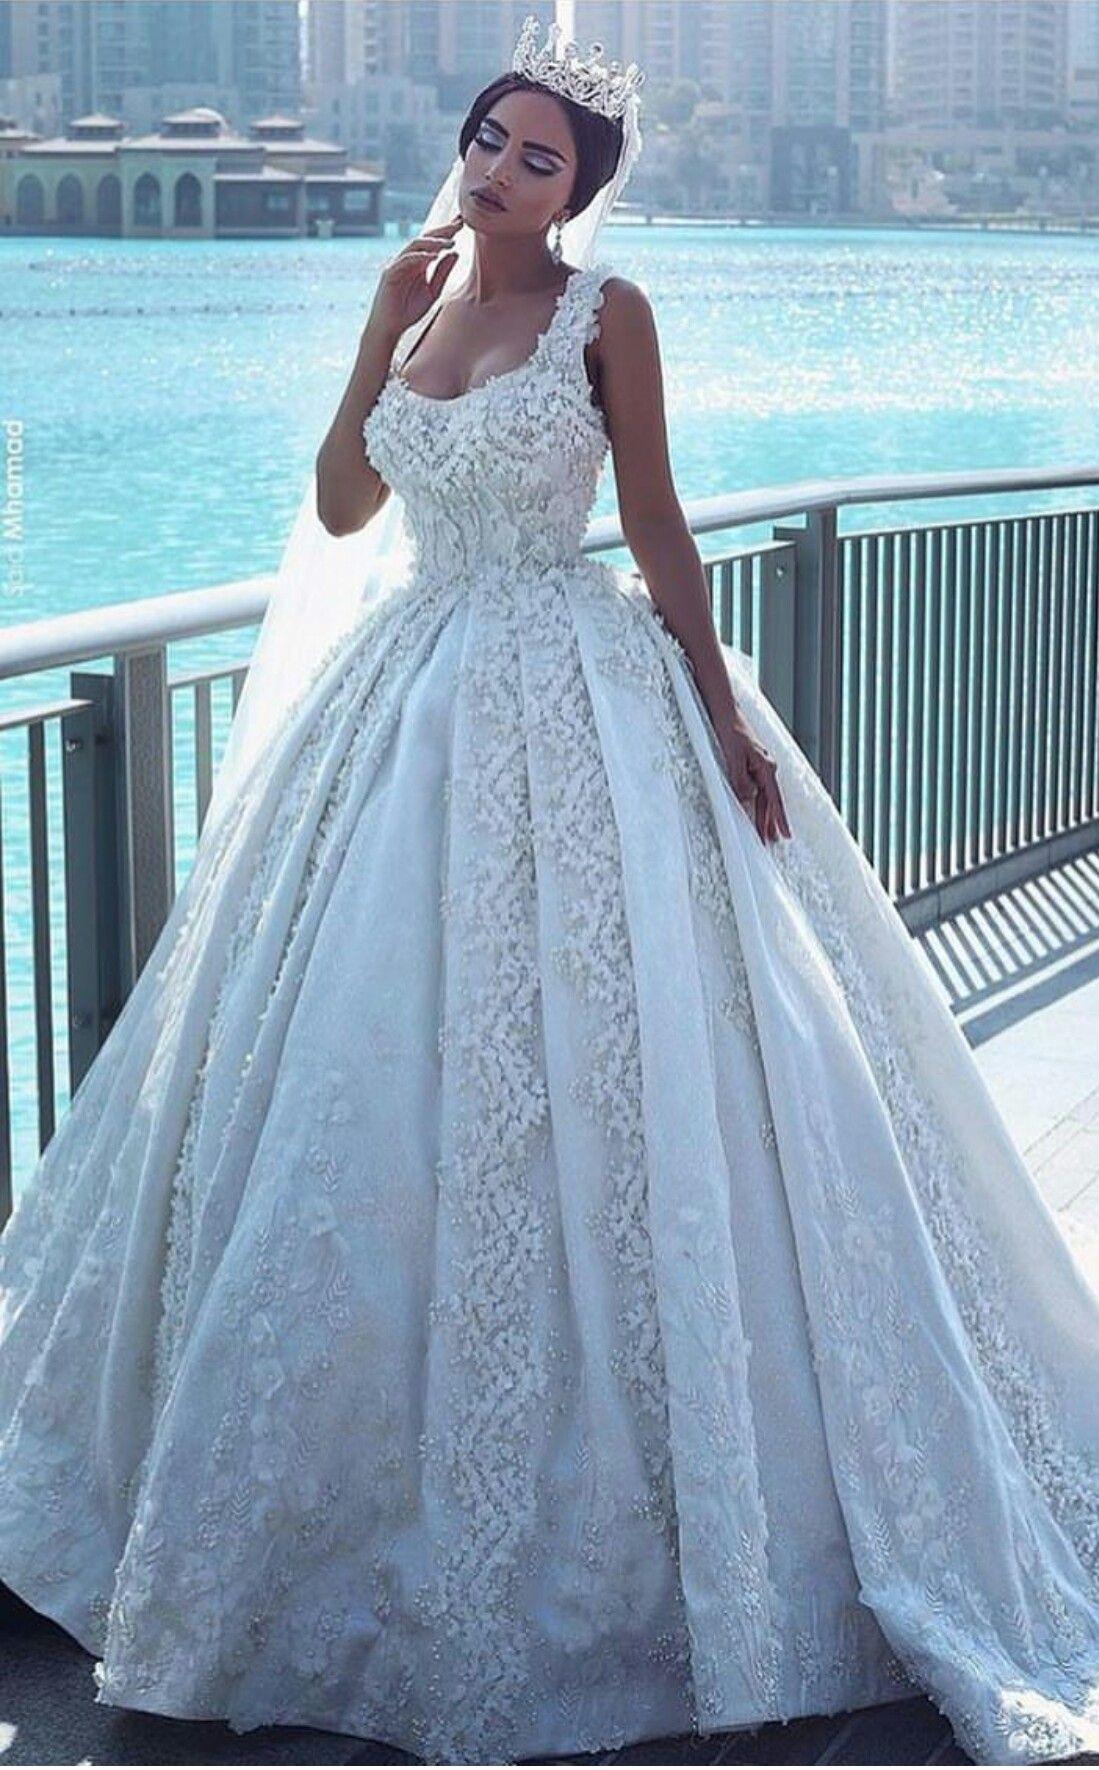 Pin de Elizabeth cook en wedding dress and accessories and ...